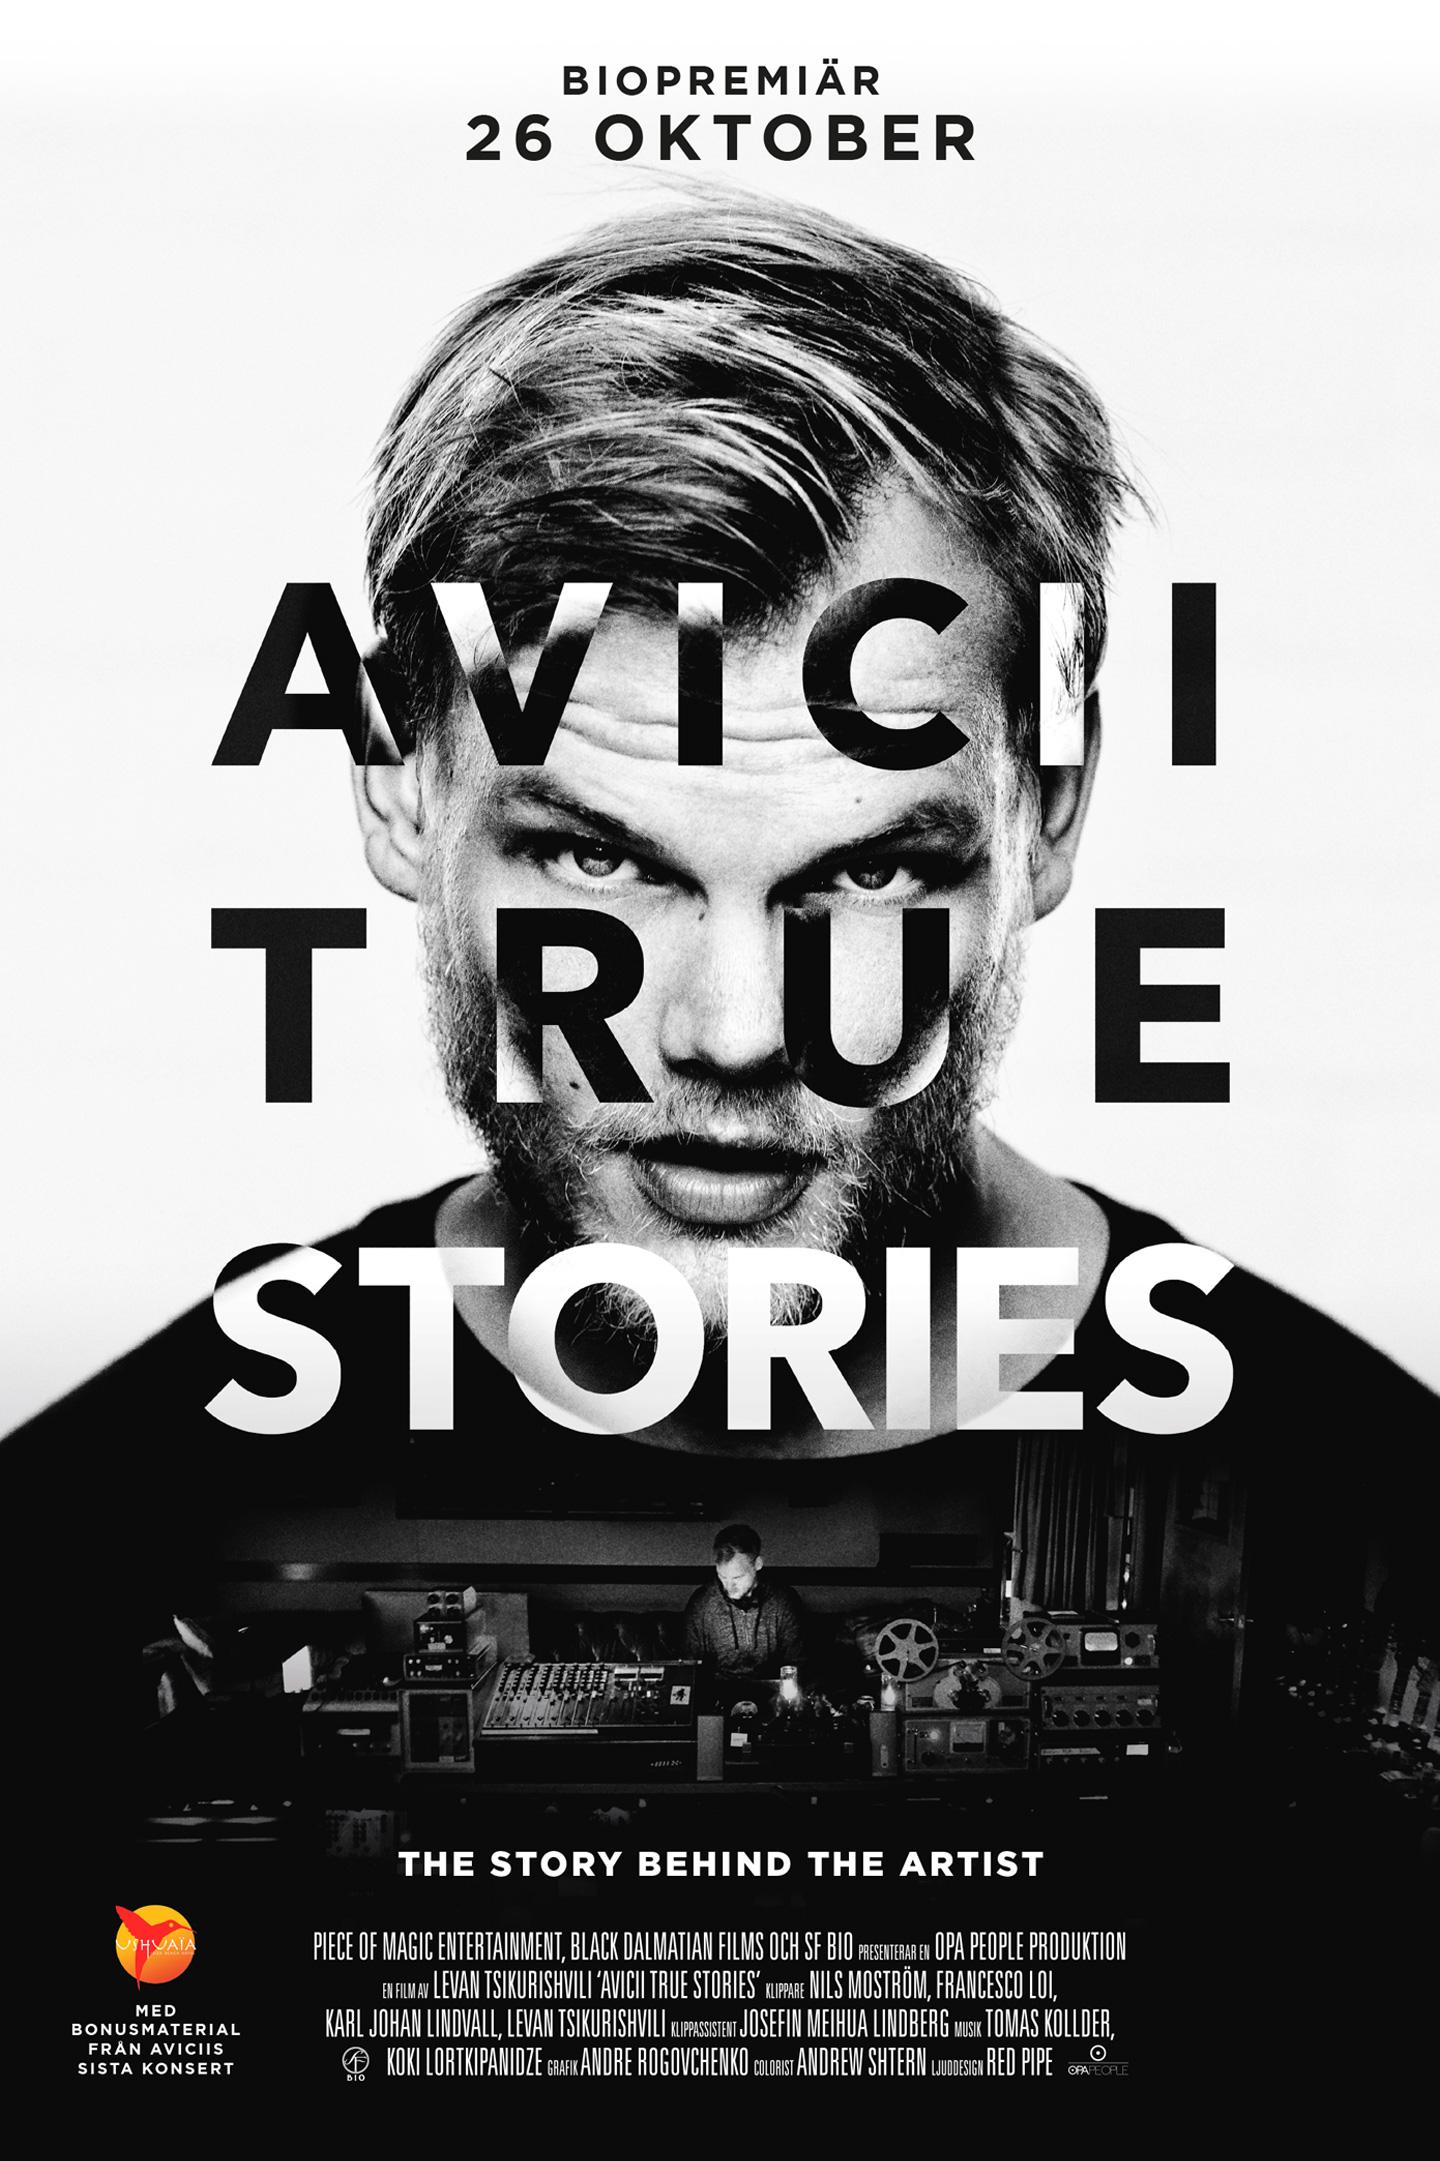 Avicii: True Stories, av Levan Tsikurishvili (svensk poster)